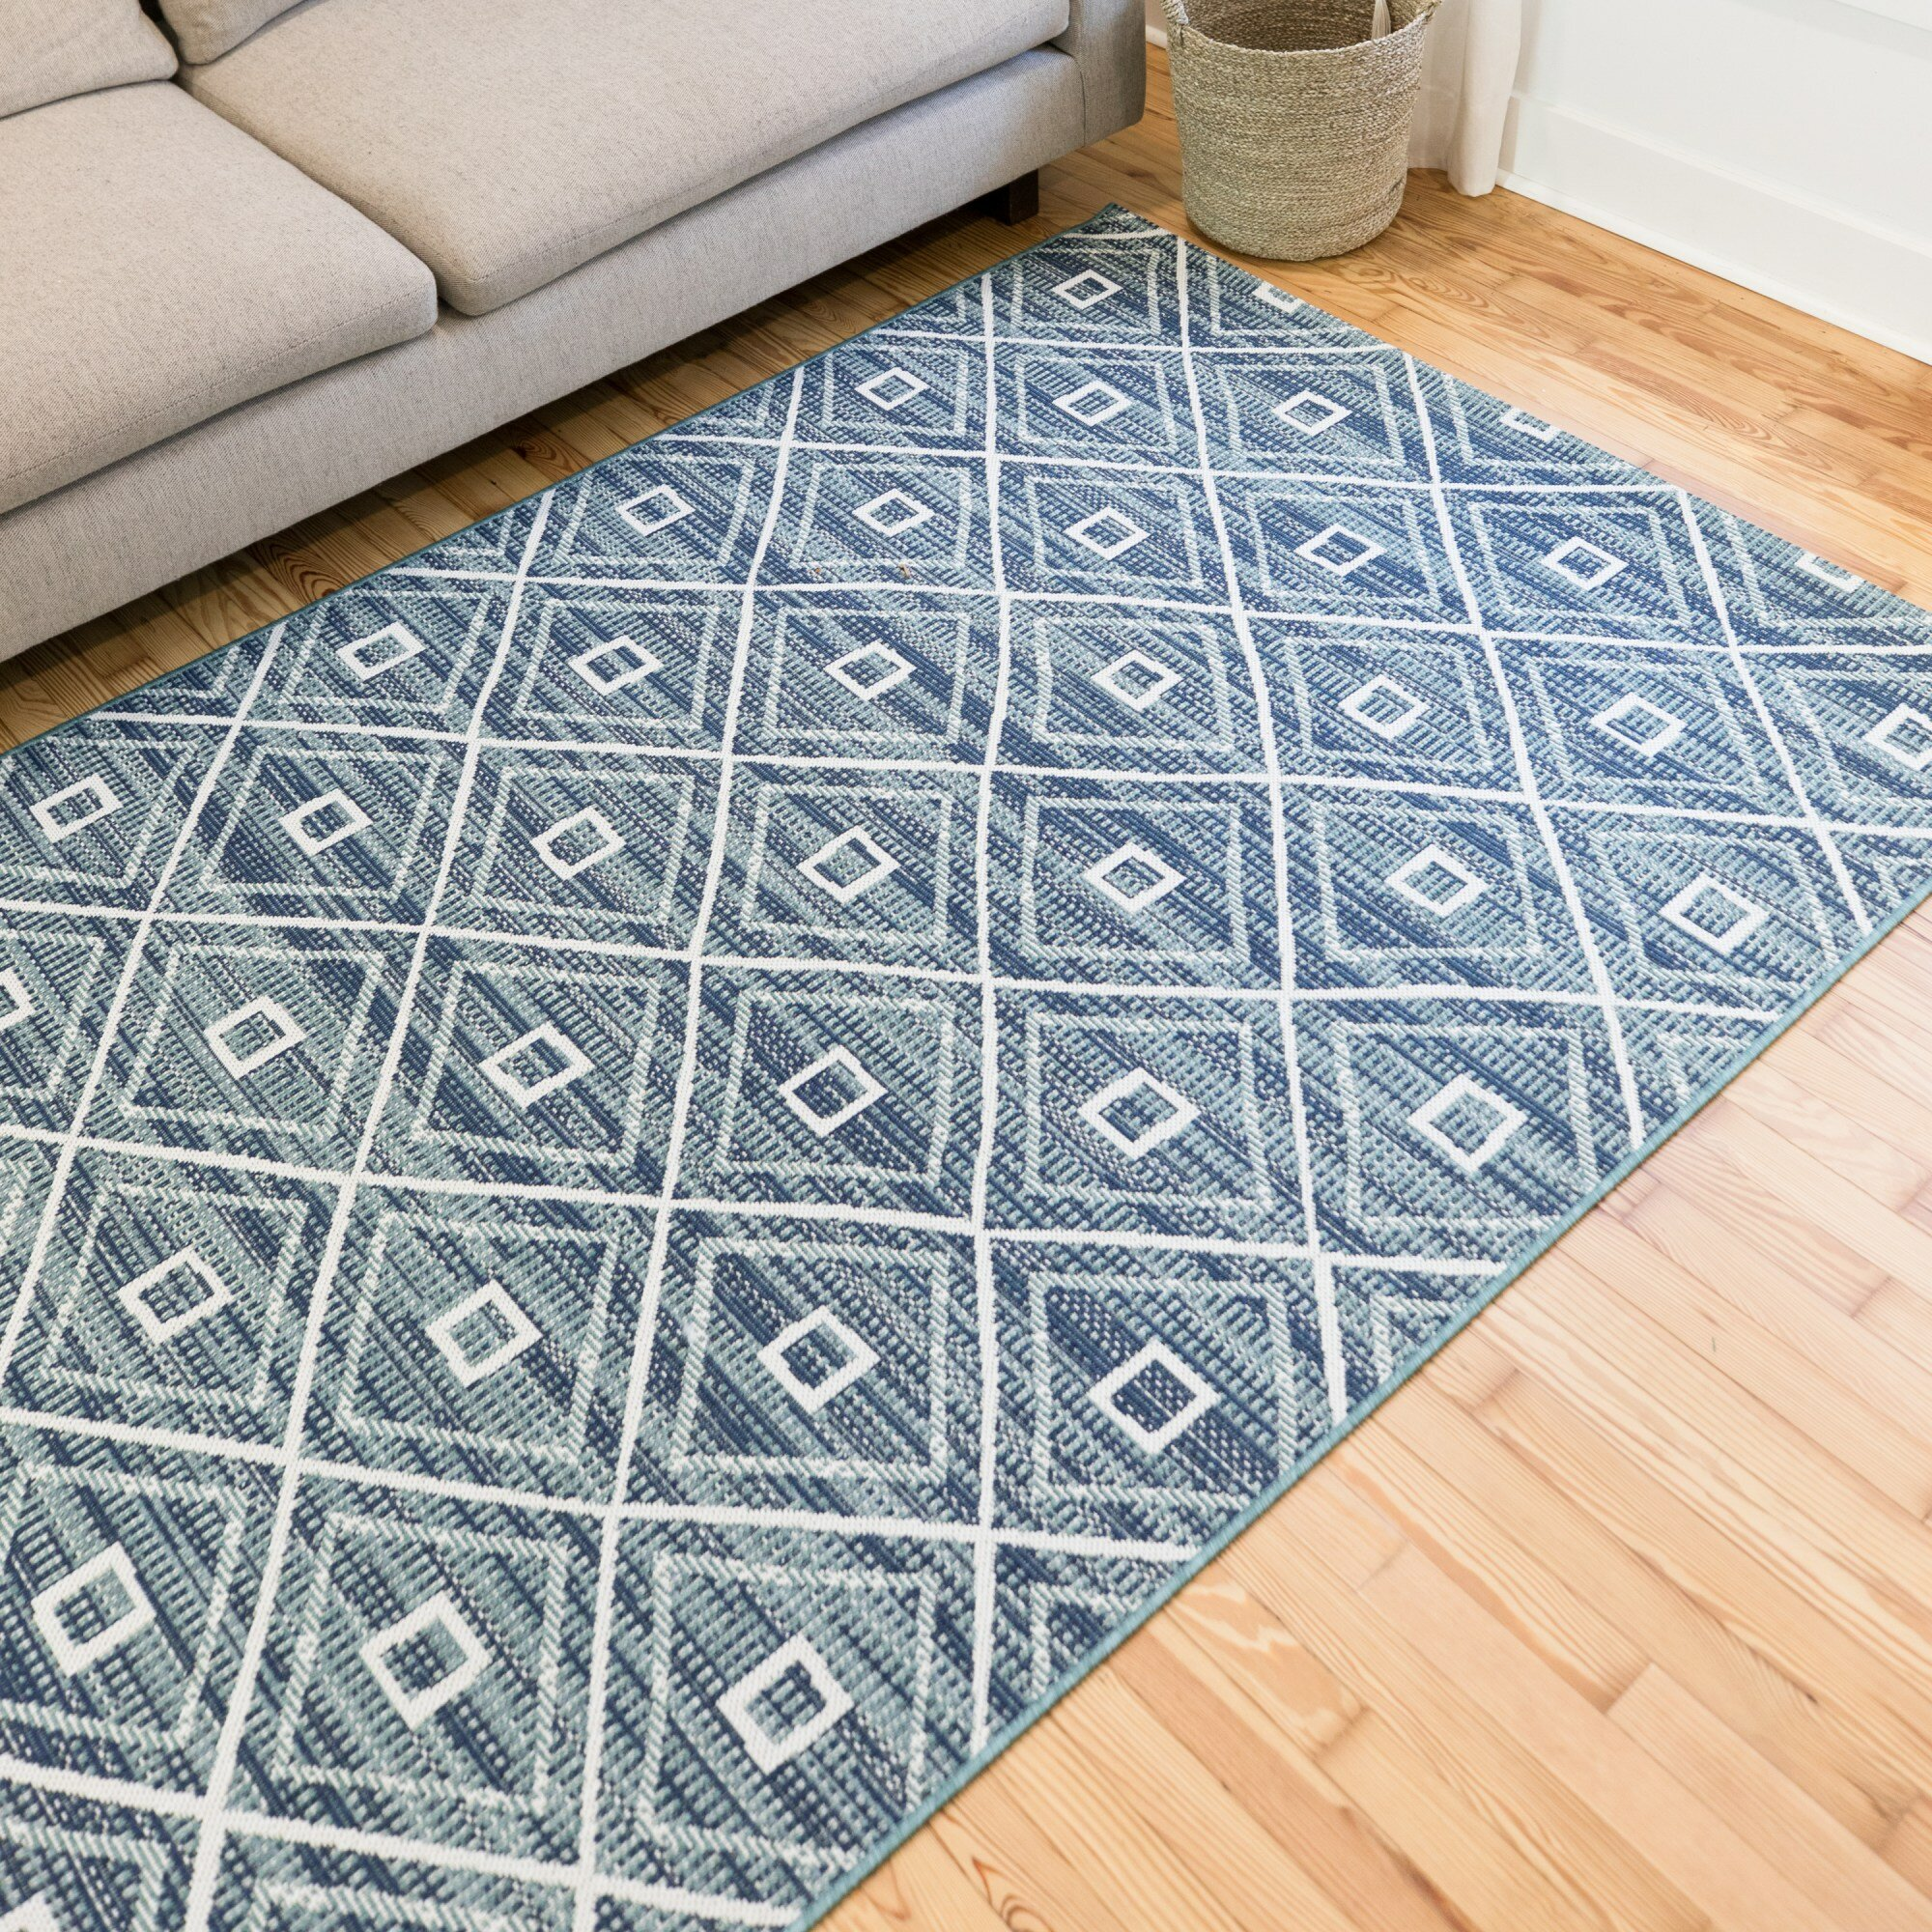 Andes Geometric Teal Indoor Outdoor